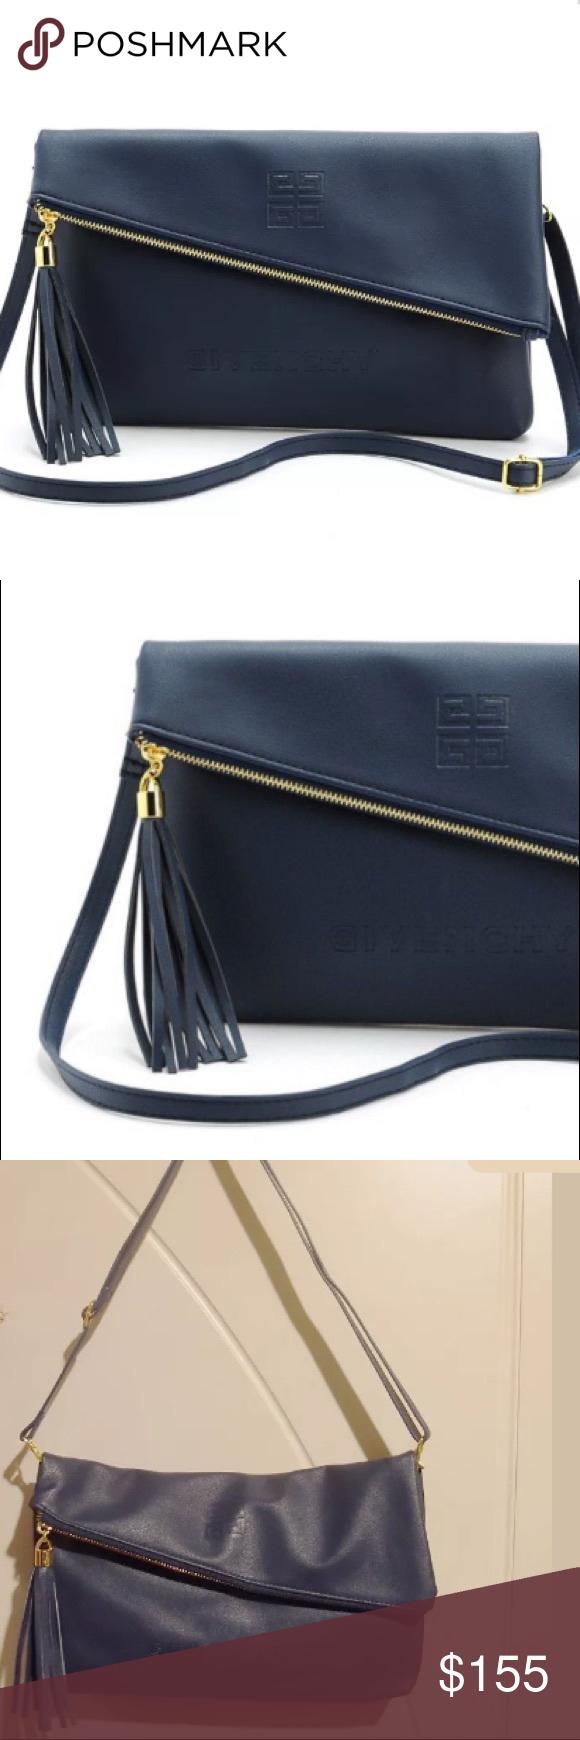 GIVENCHY Parfums VIP GIFT-Clutch Shoulder Bag 100% Authentic GIVENCHY  PARFUMS VIP Gift 0b85bf6fff